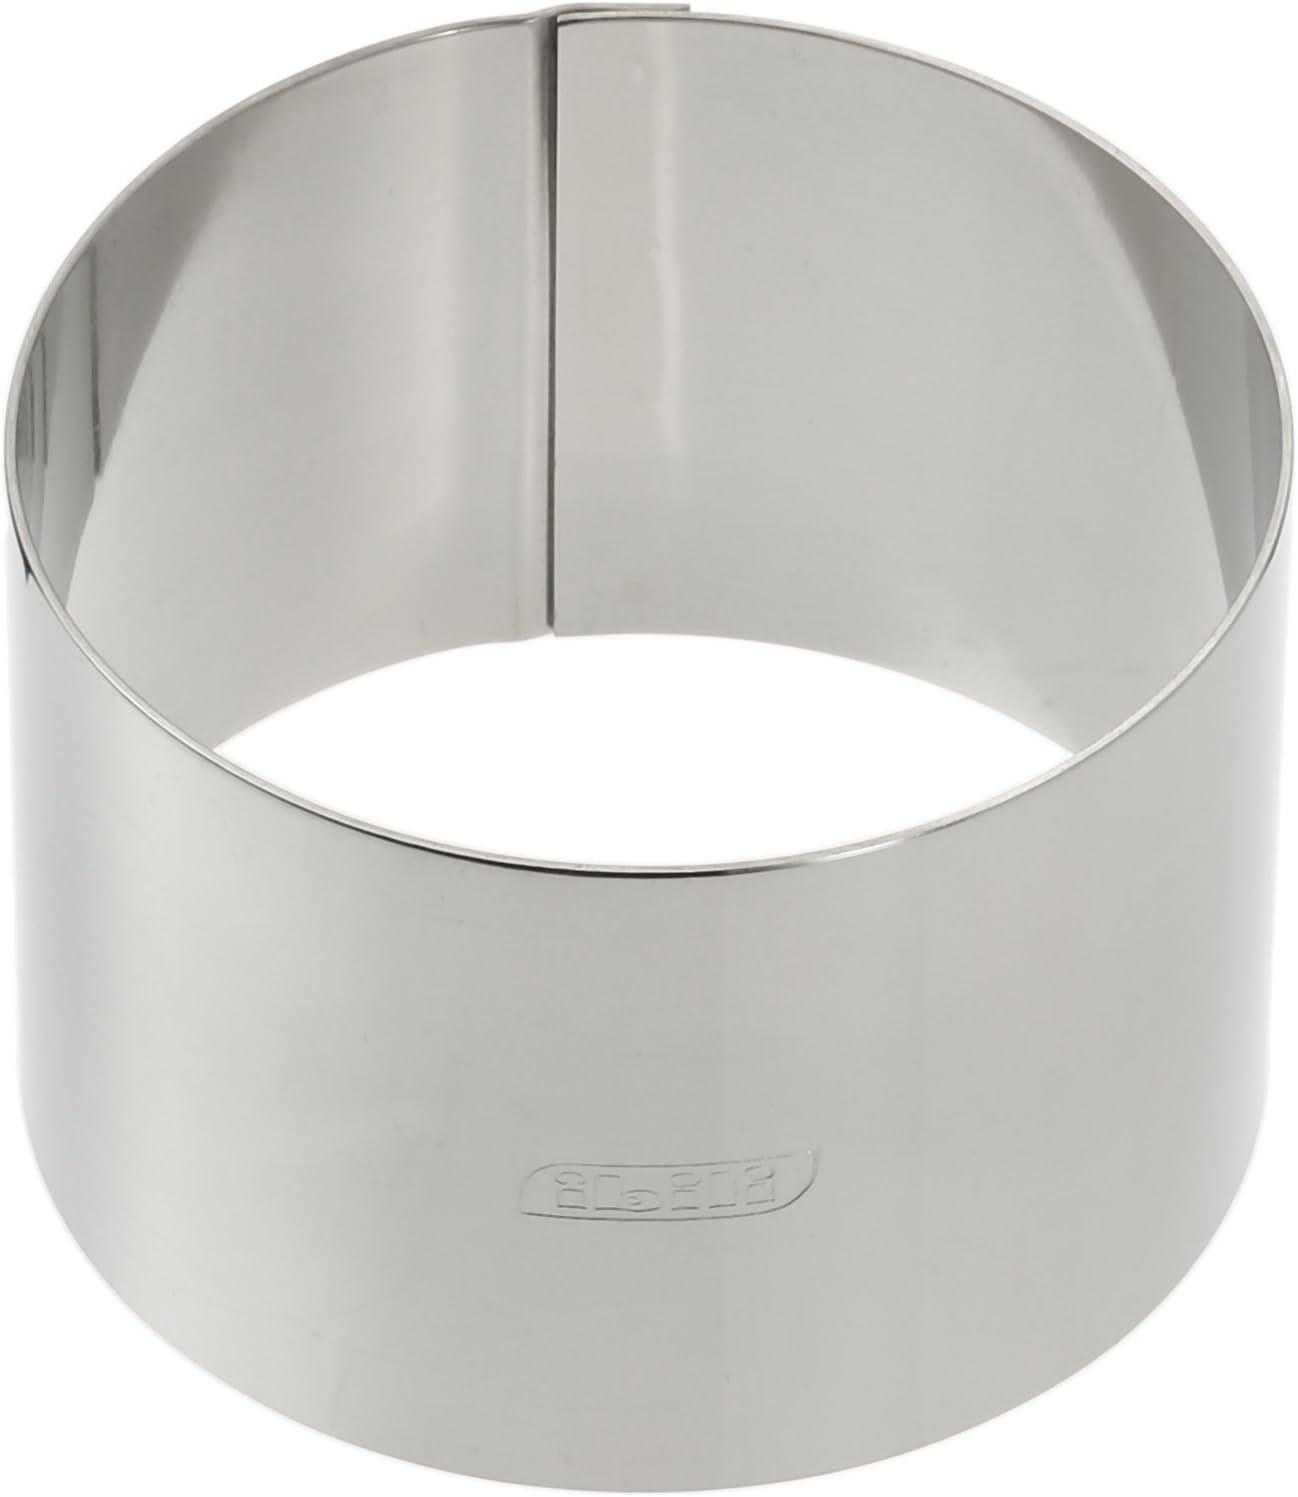 Argent INOX IBILI 716109 Cercle 19 x 9,5 x 19 cm